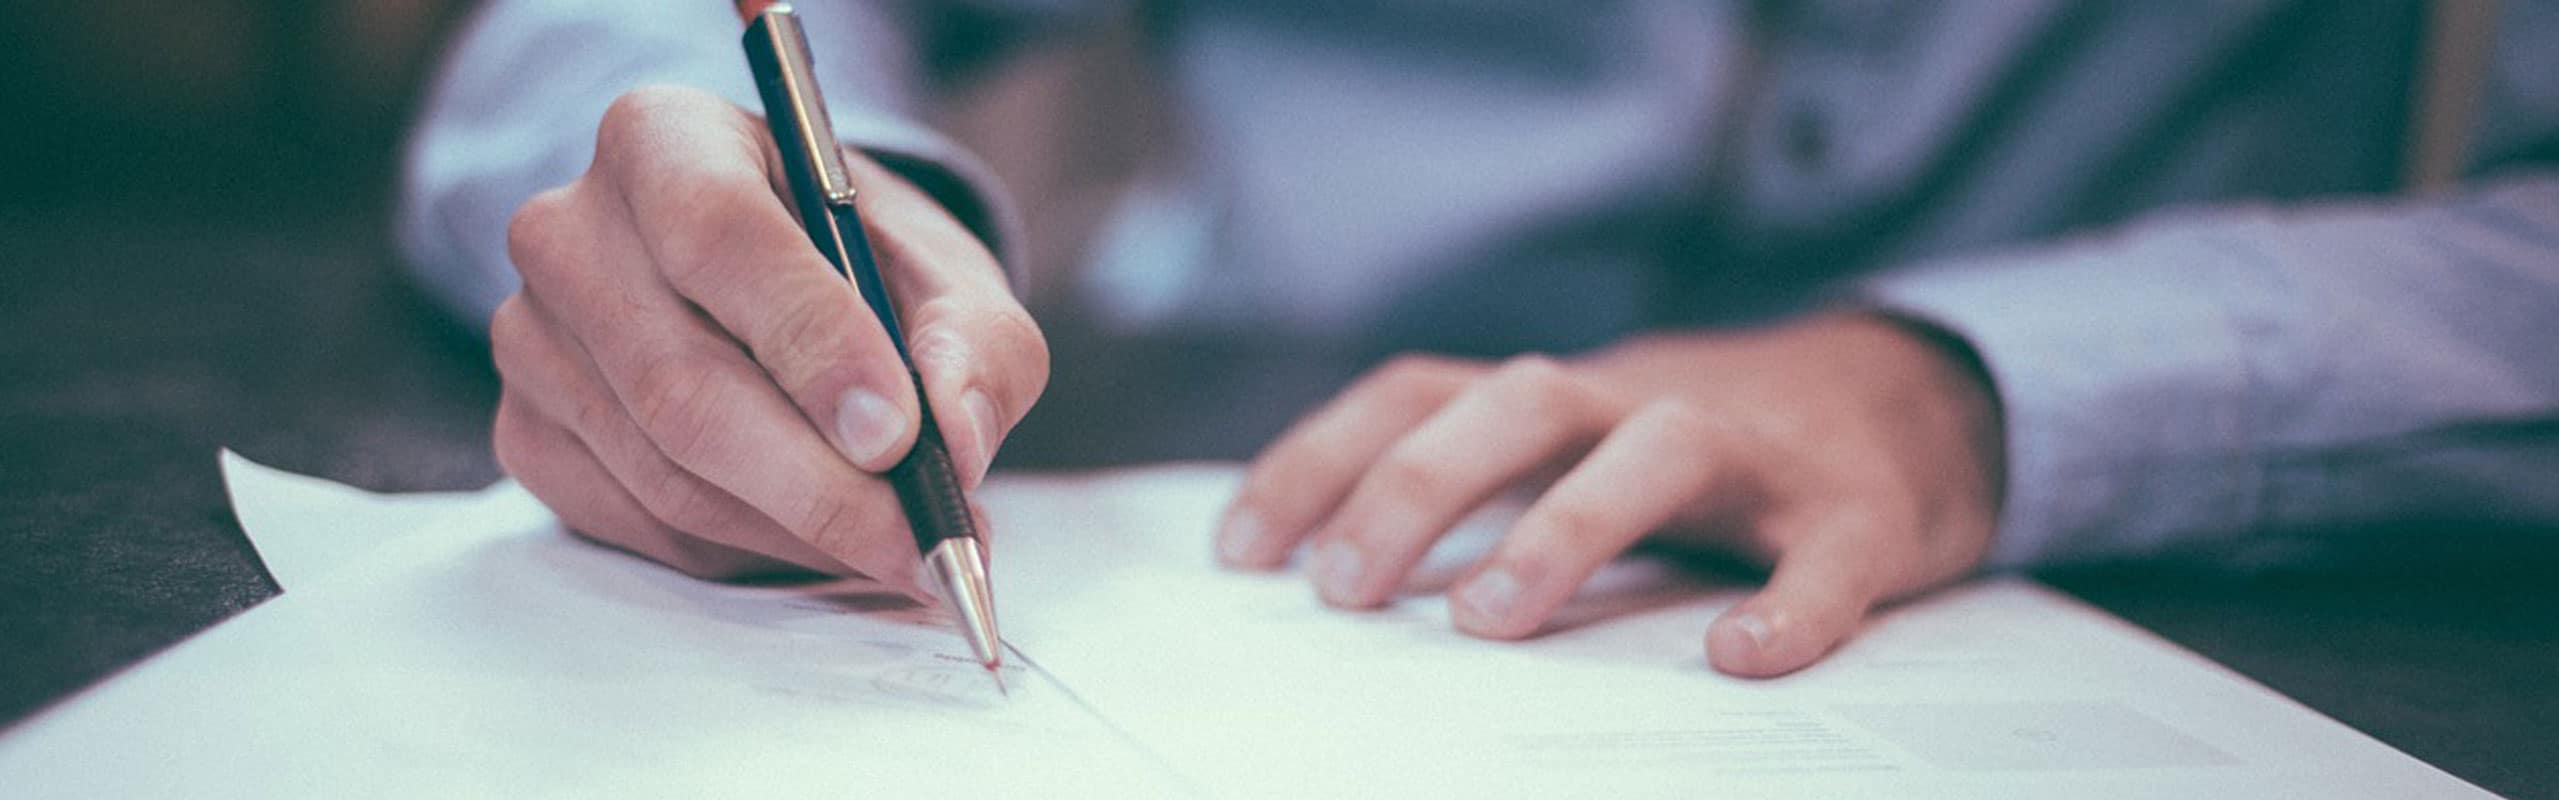 Descubre los distintos tipos de documentos administrativos en un despacho de abogados